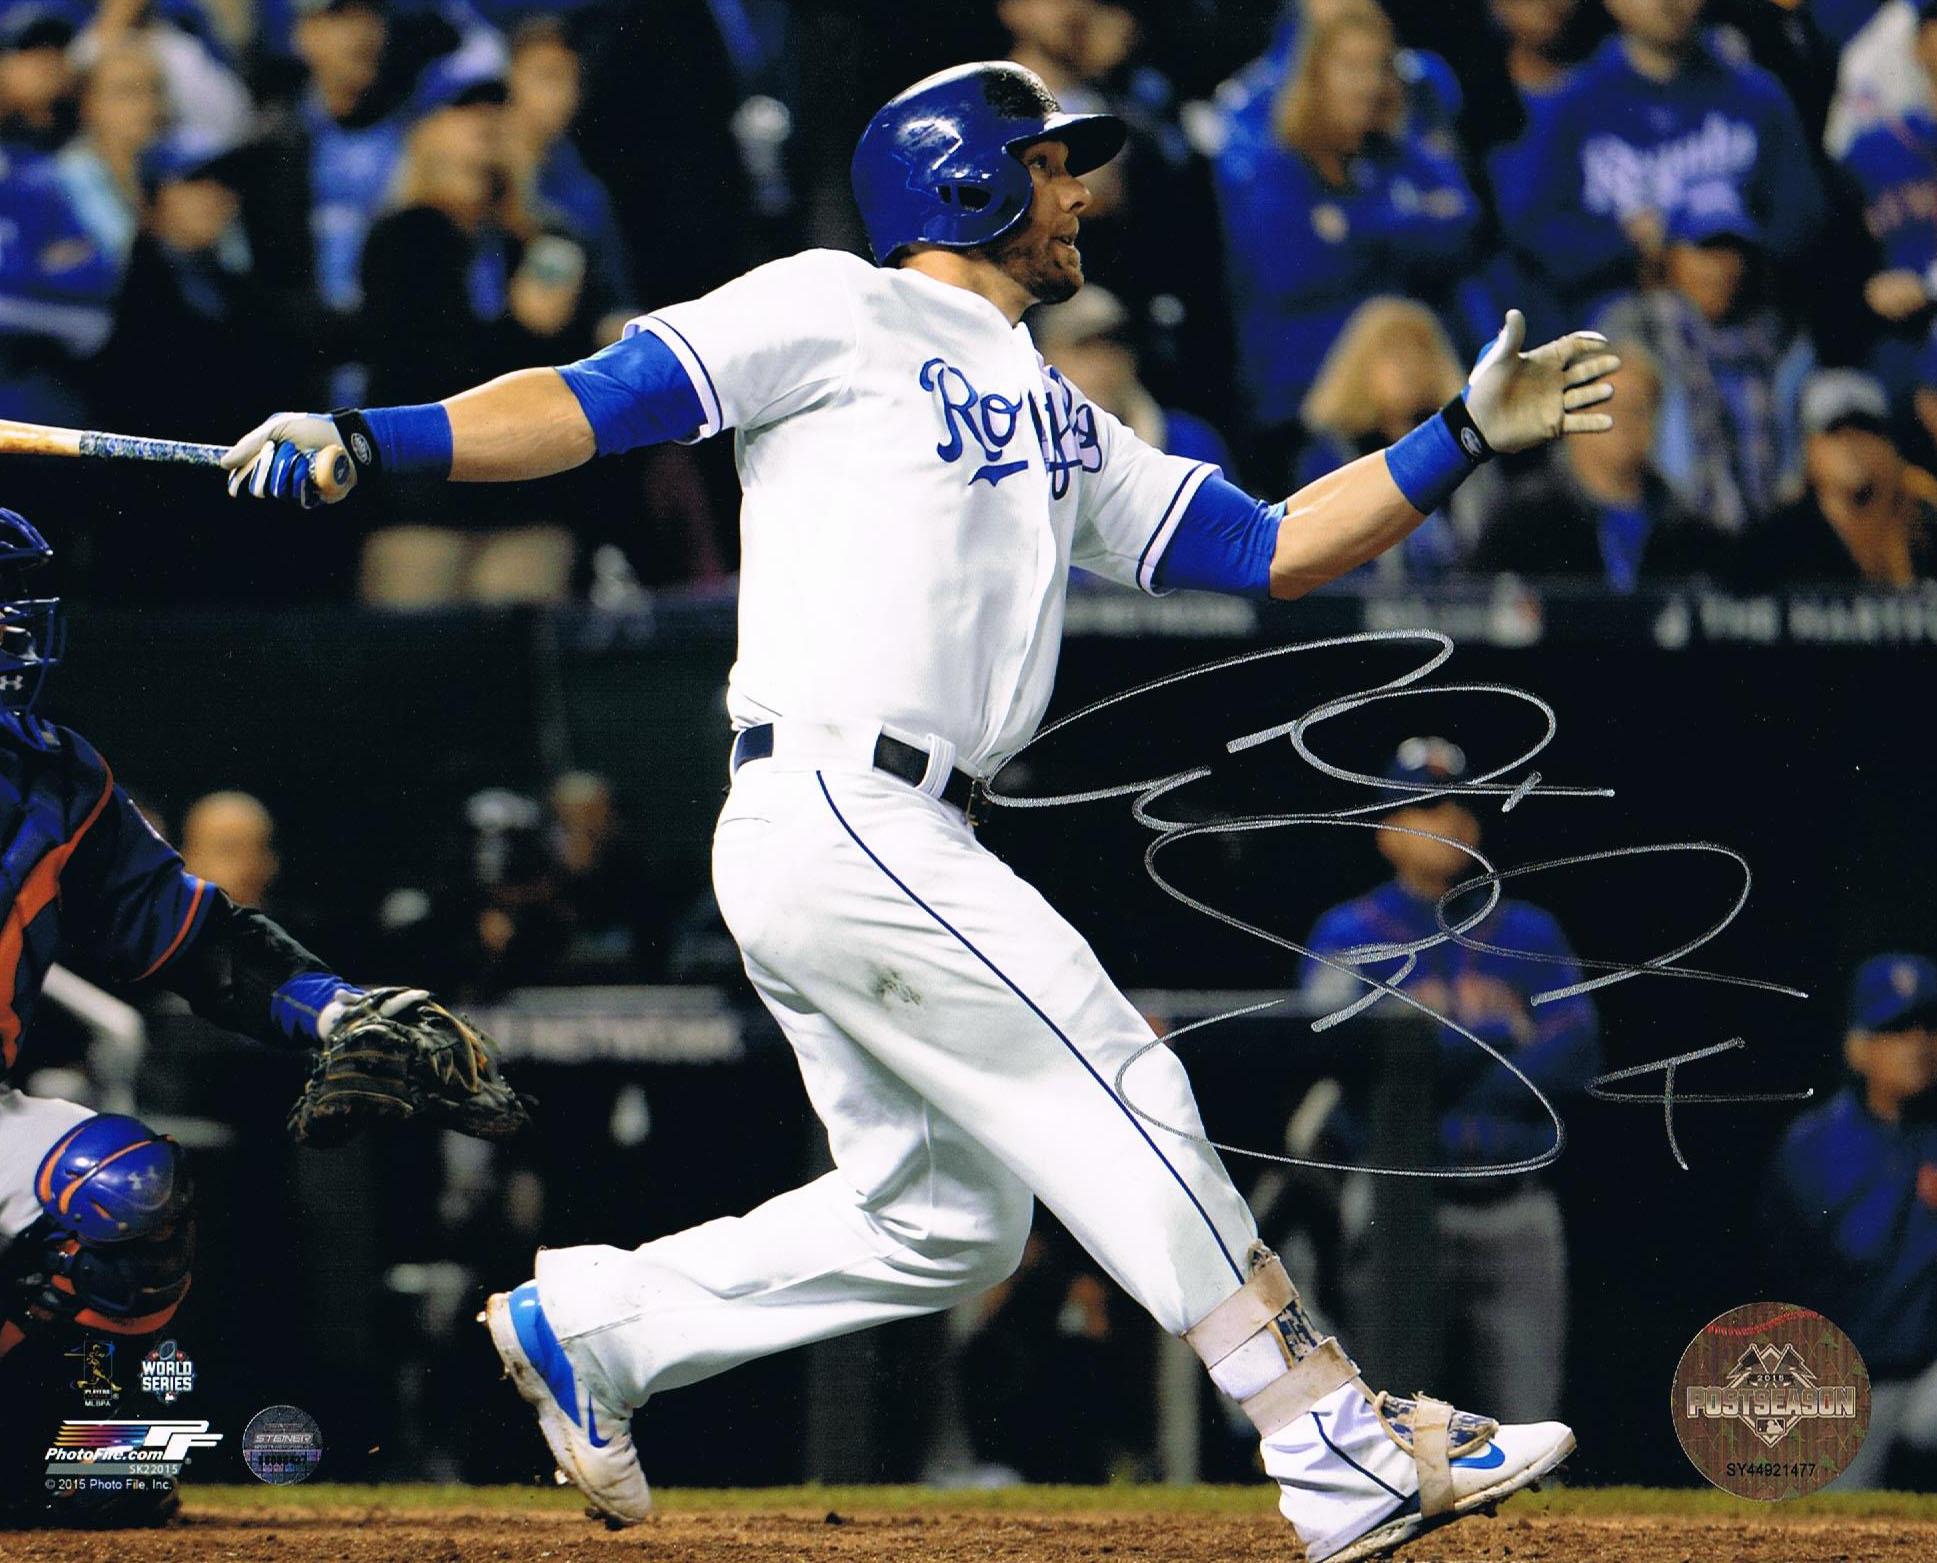 Alex Gordon Autographed Royals 2015 World Series Signed